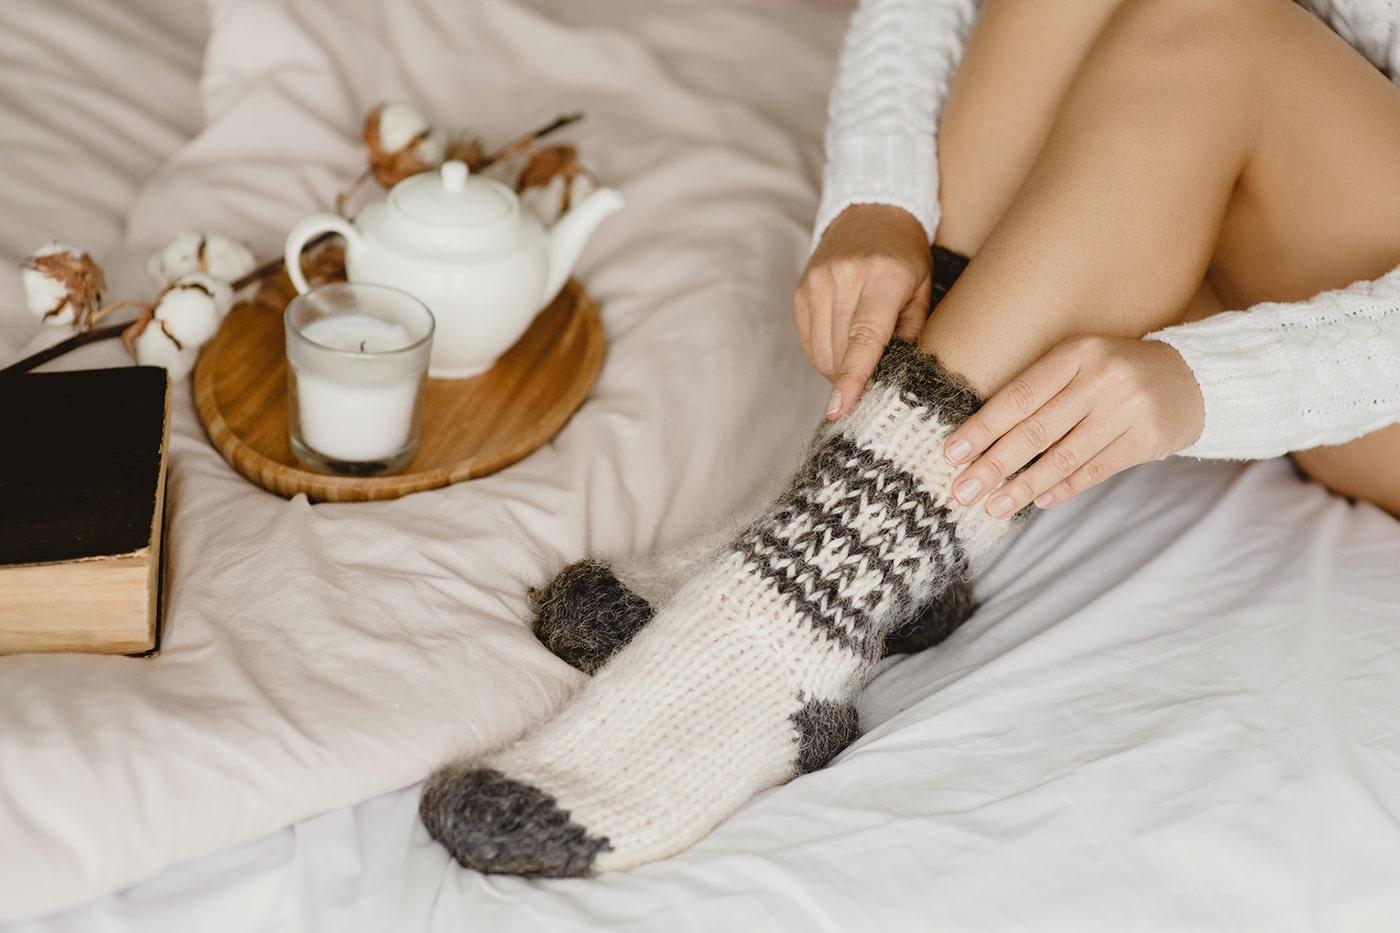 Woman putting on socks